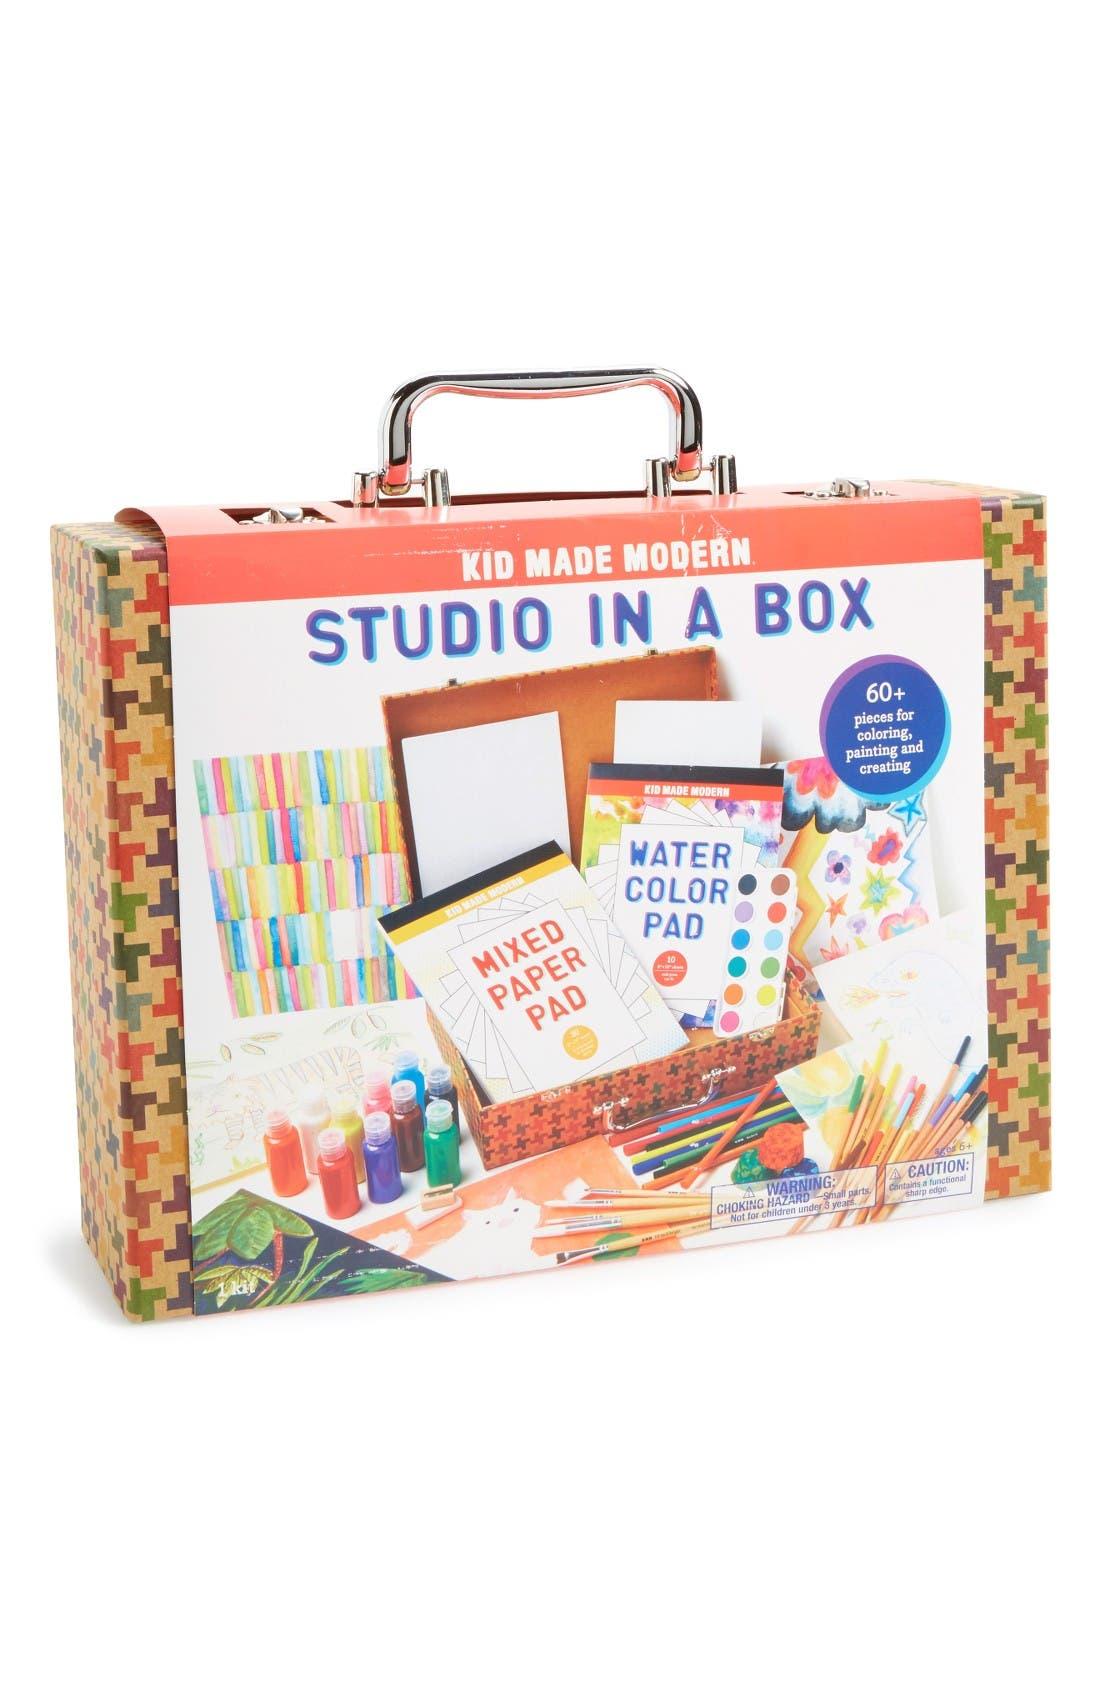 Kid Made Modern Studio In A Box Kit